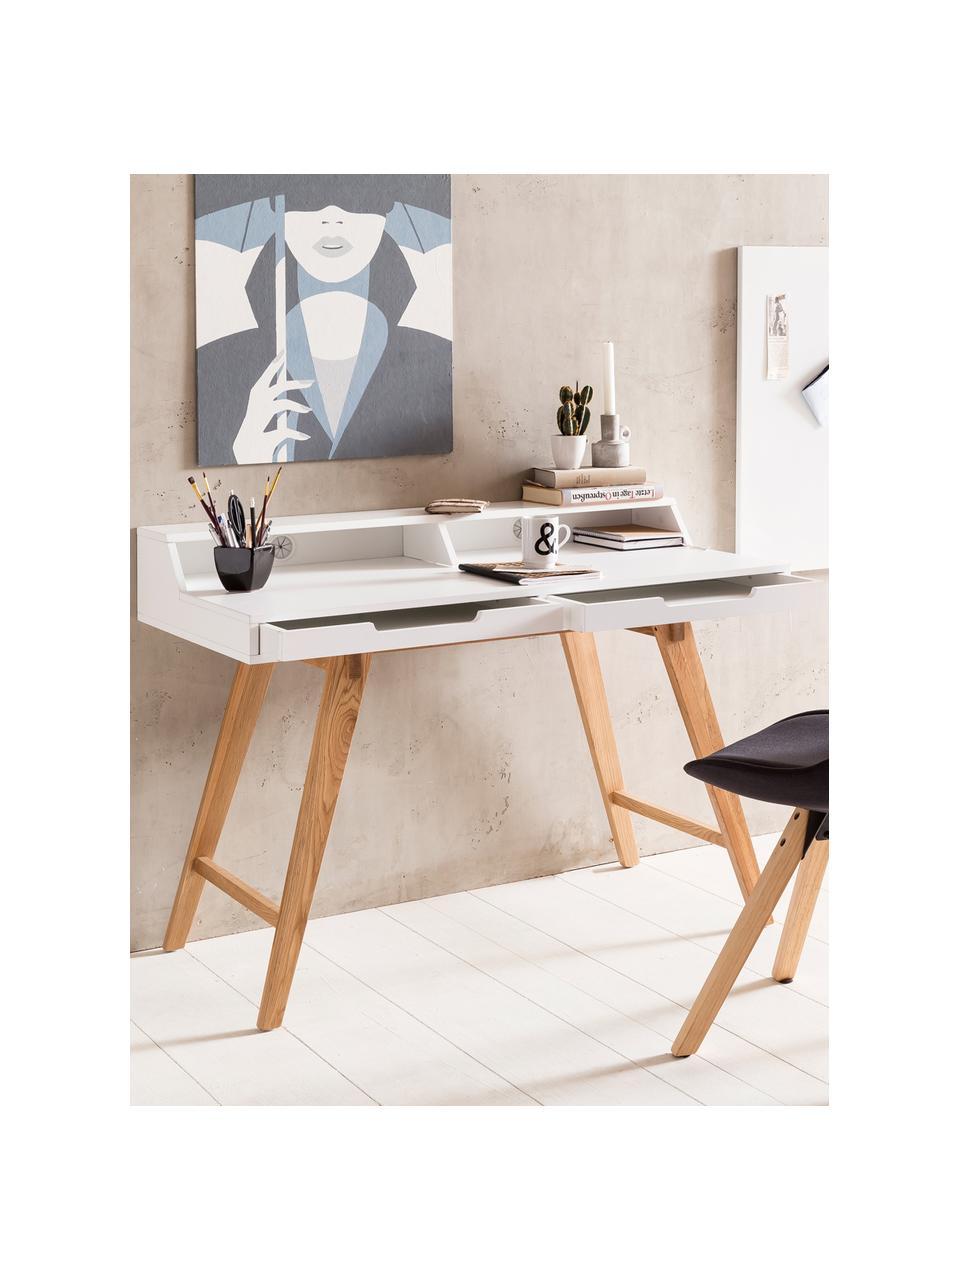 Bureau avec pieds en bois Skandi, Blanc, bois de chêne